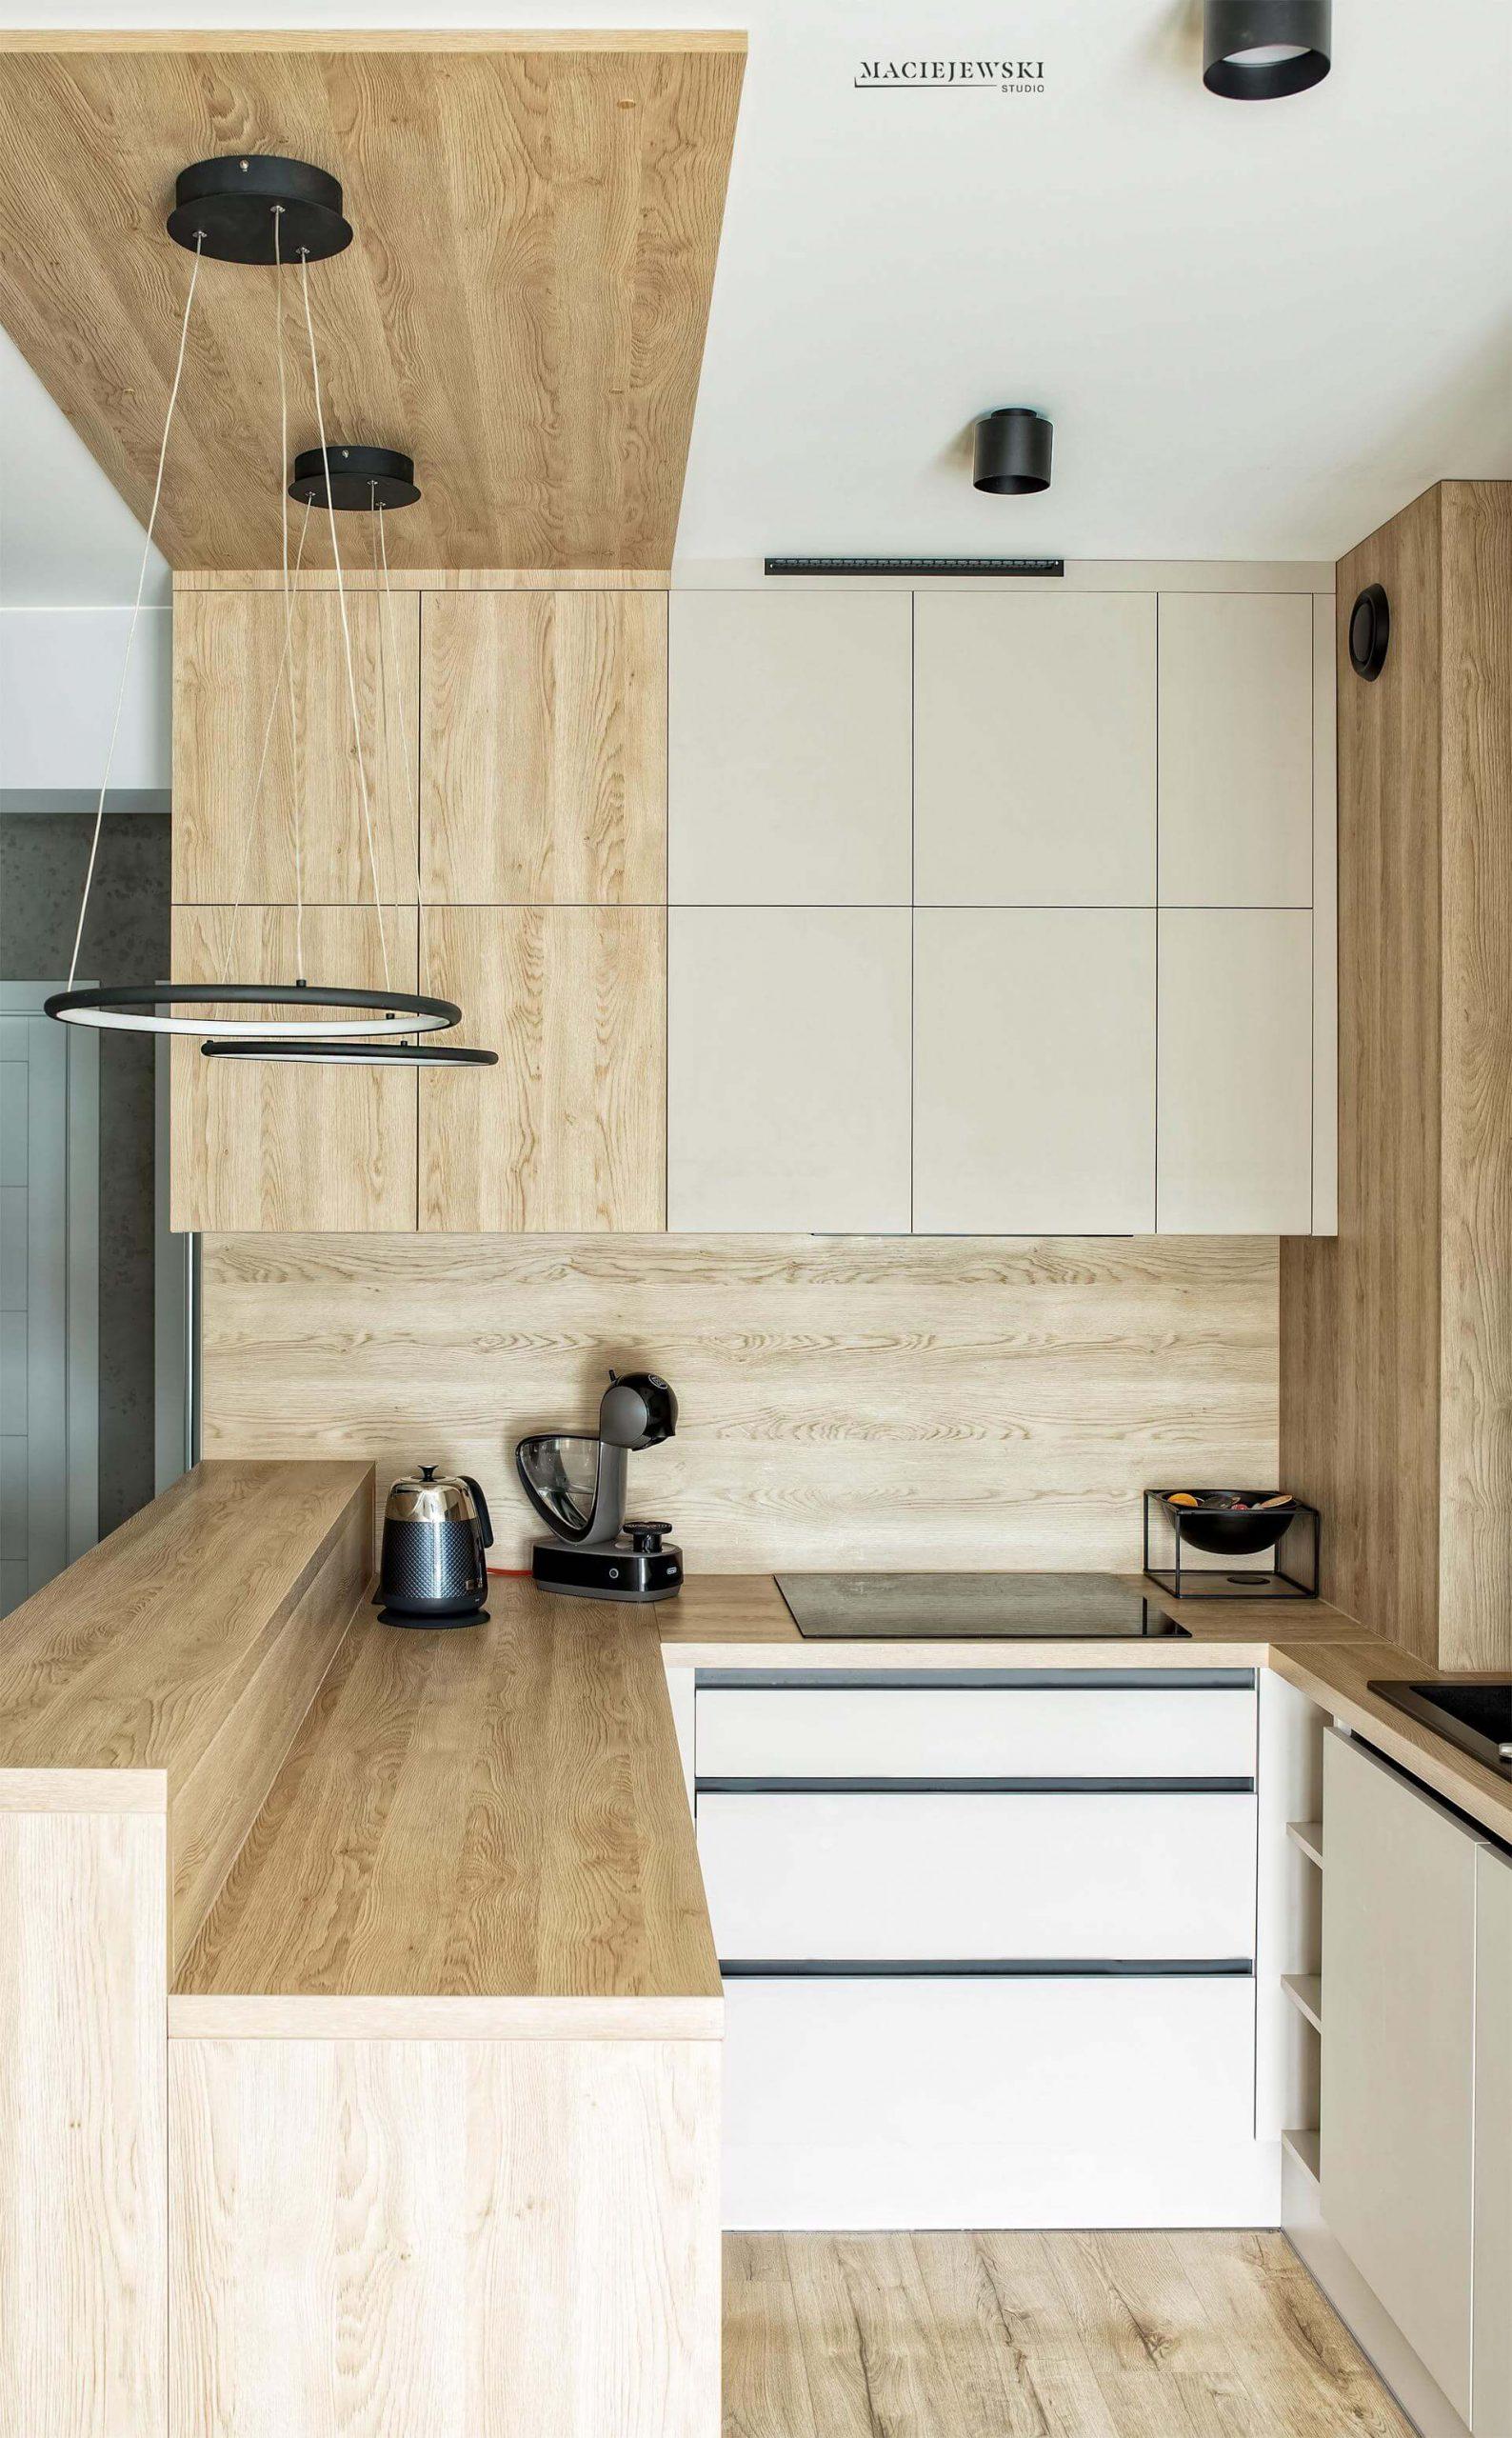 Maciejewski Studio - projekt kuchni